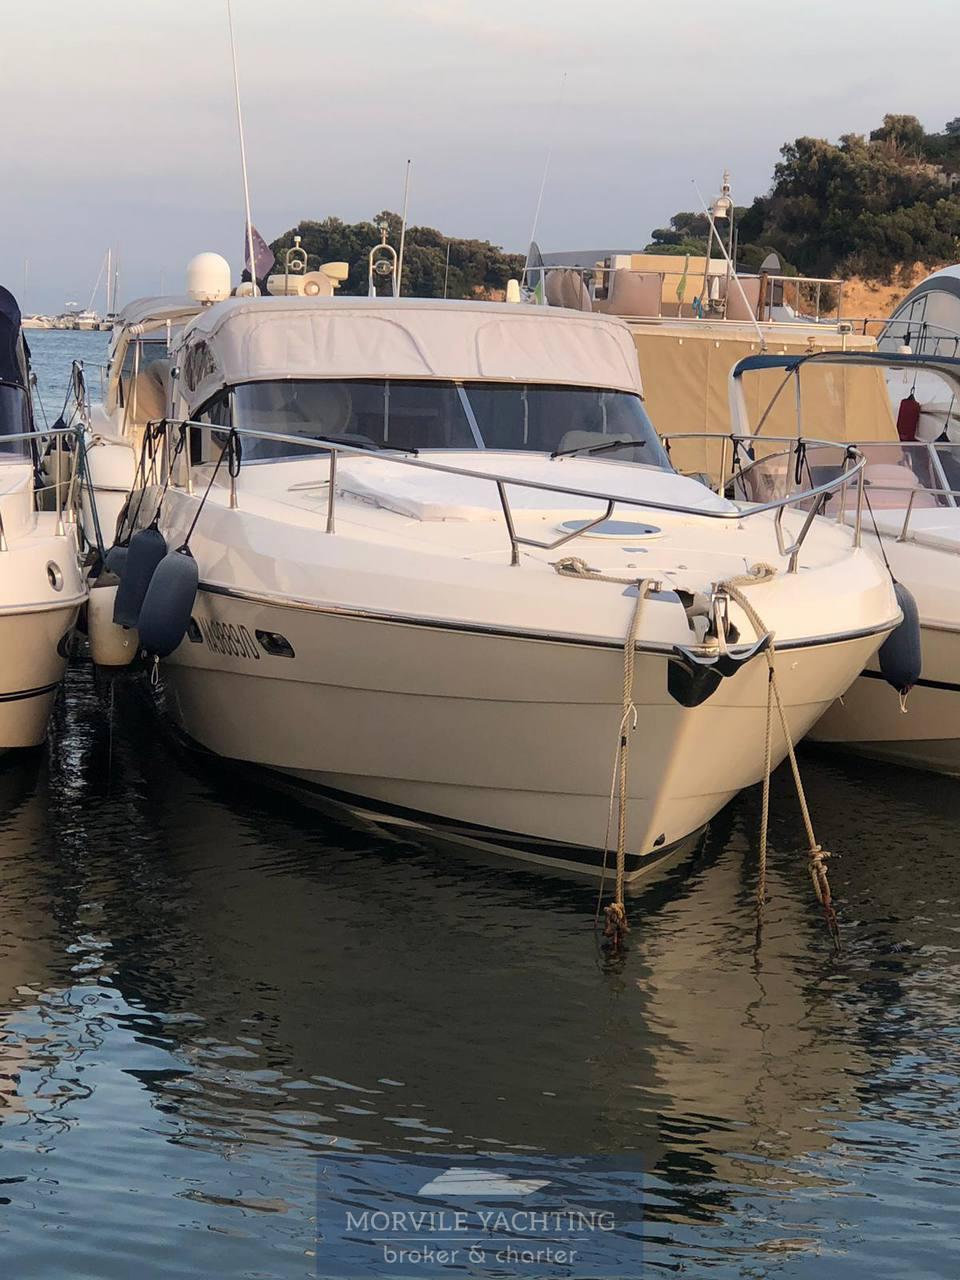 Fiart 38 genius motor boat